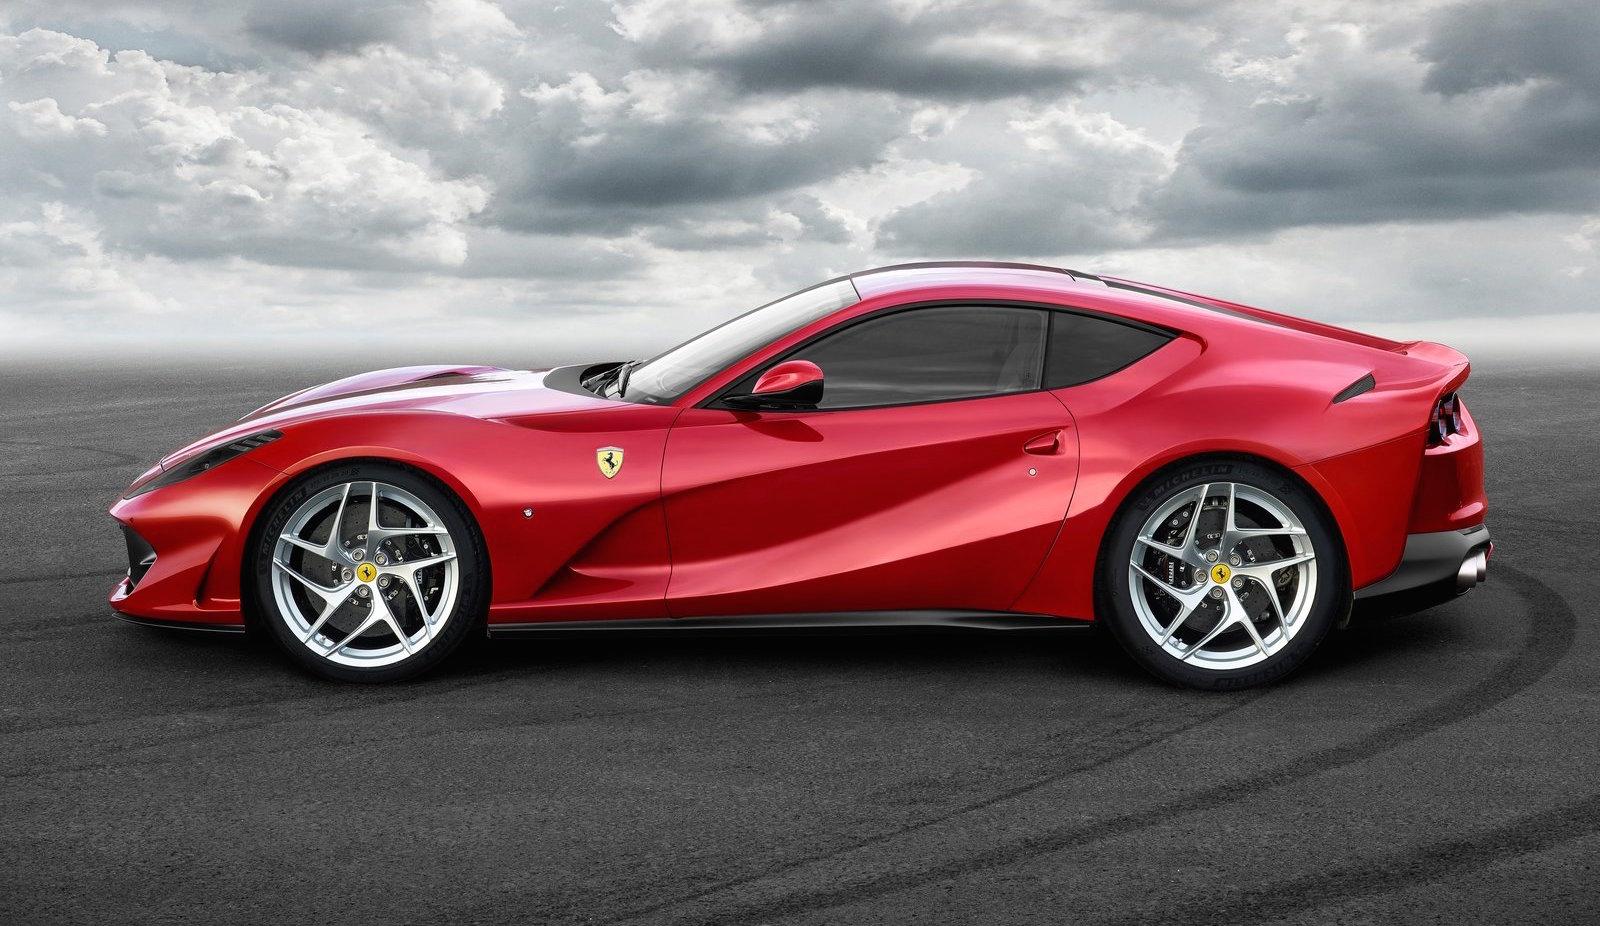 Elegant Ferrari 812 Superfast